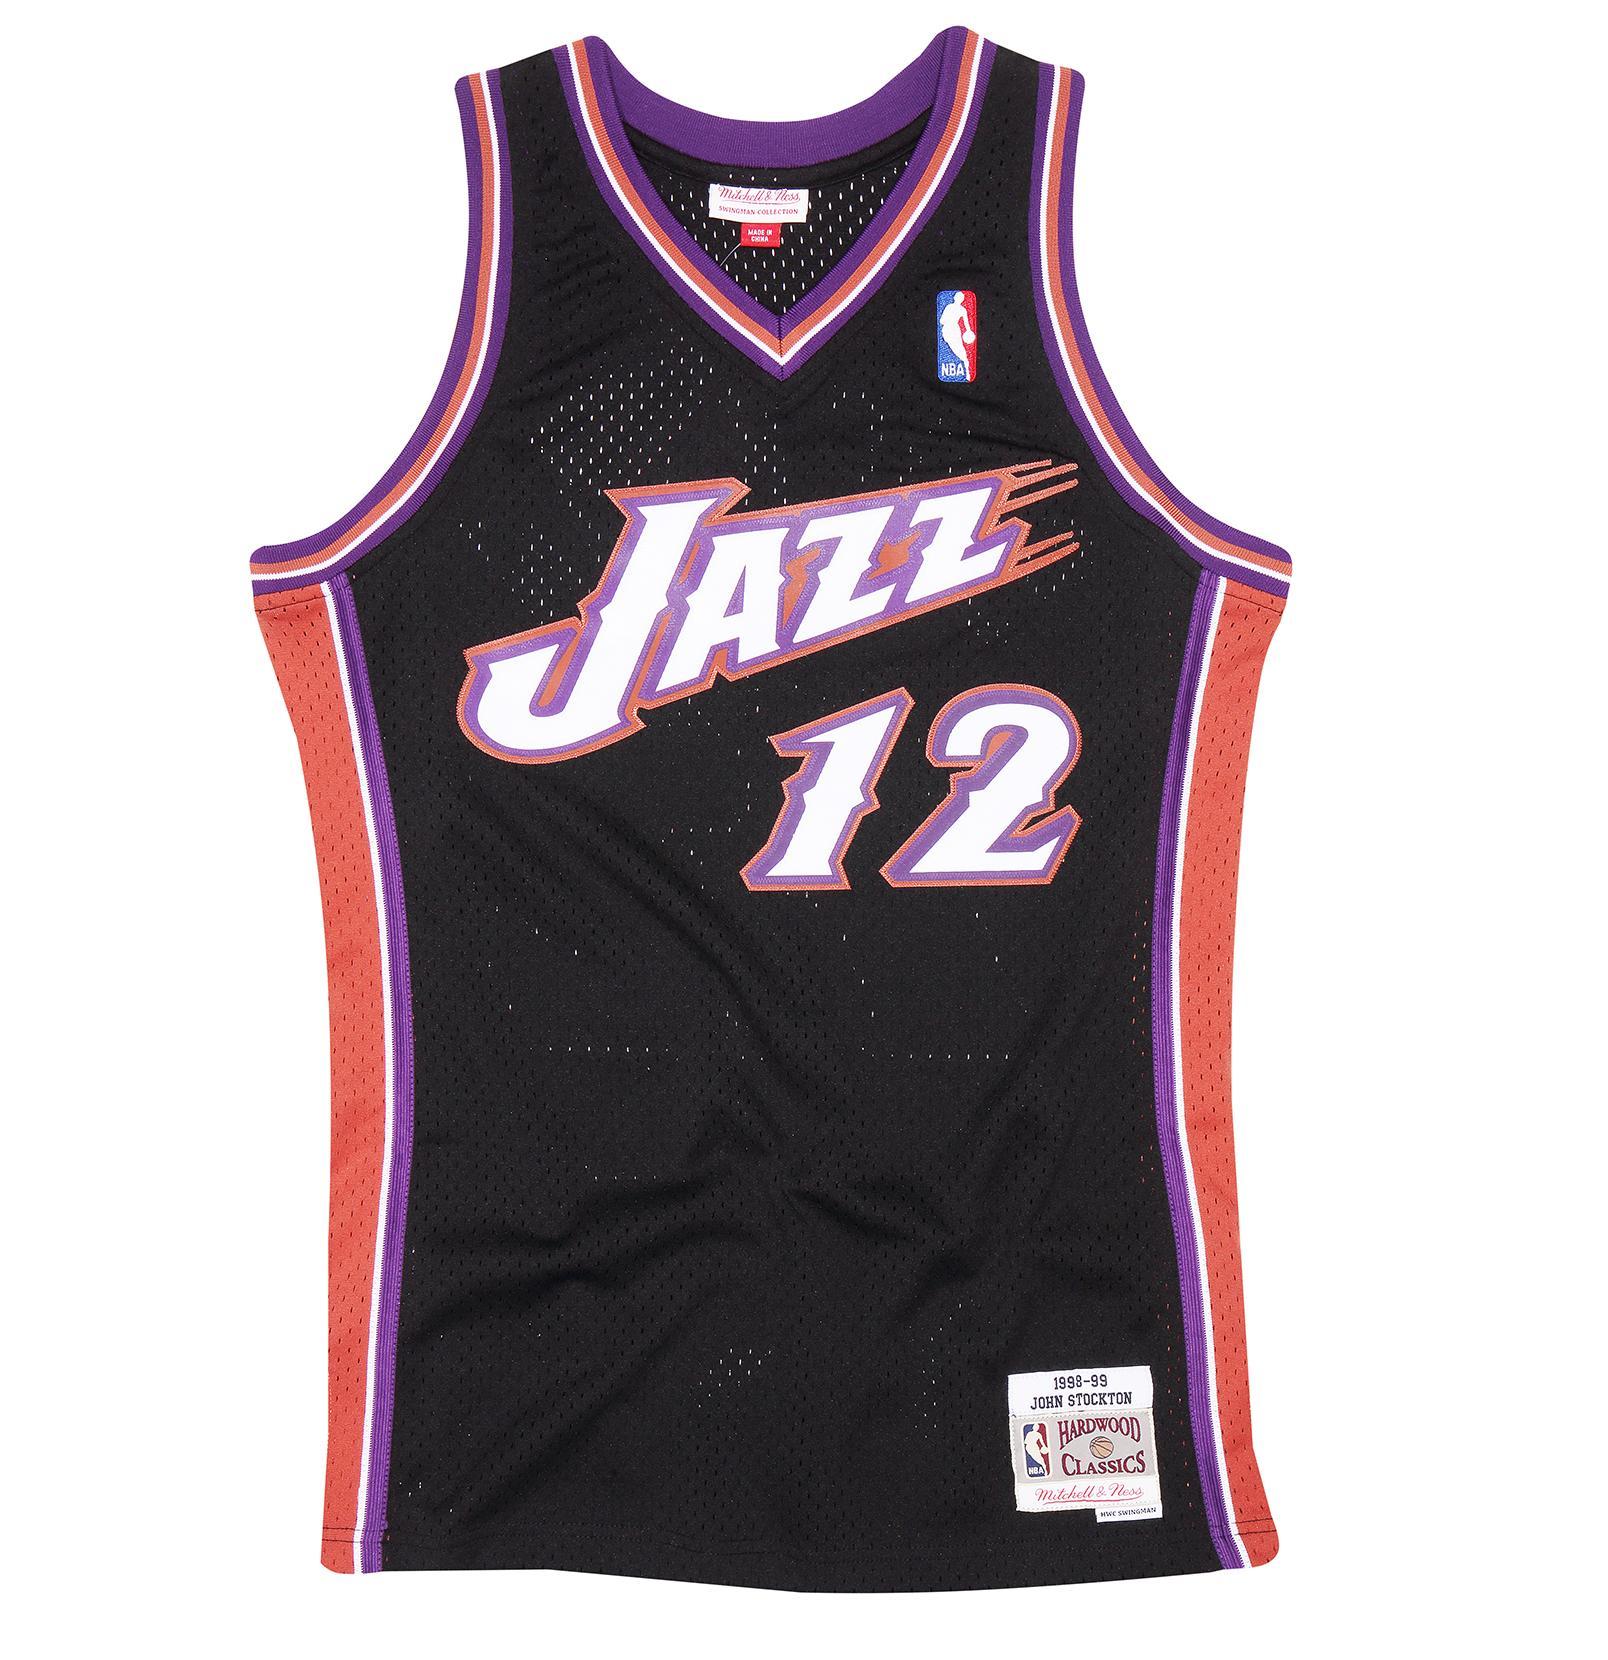 timeless design 51f83 fd88b Mitchell & Ness | John Stockton 1998-99 Utah Jazz Swingman ...